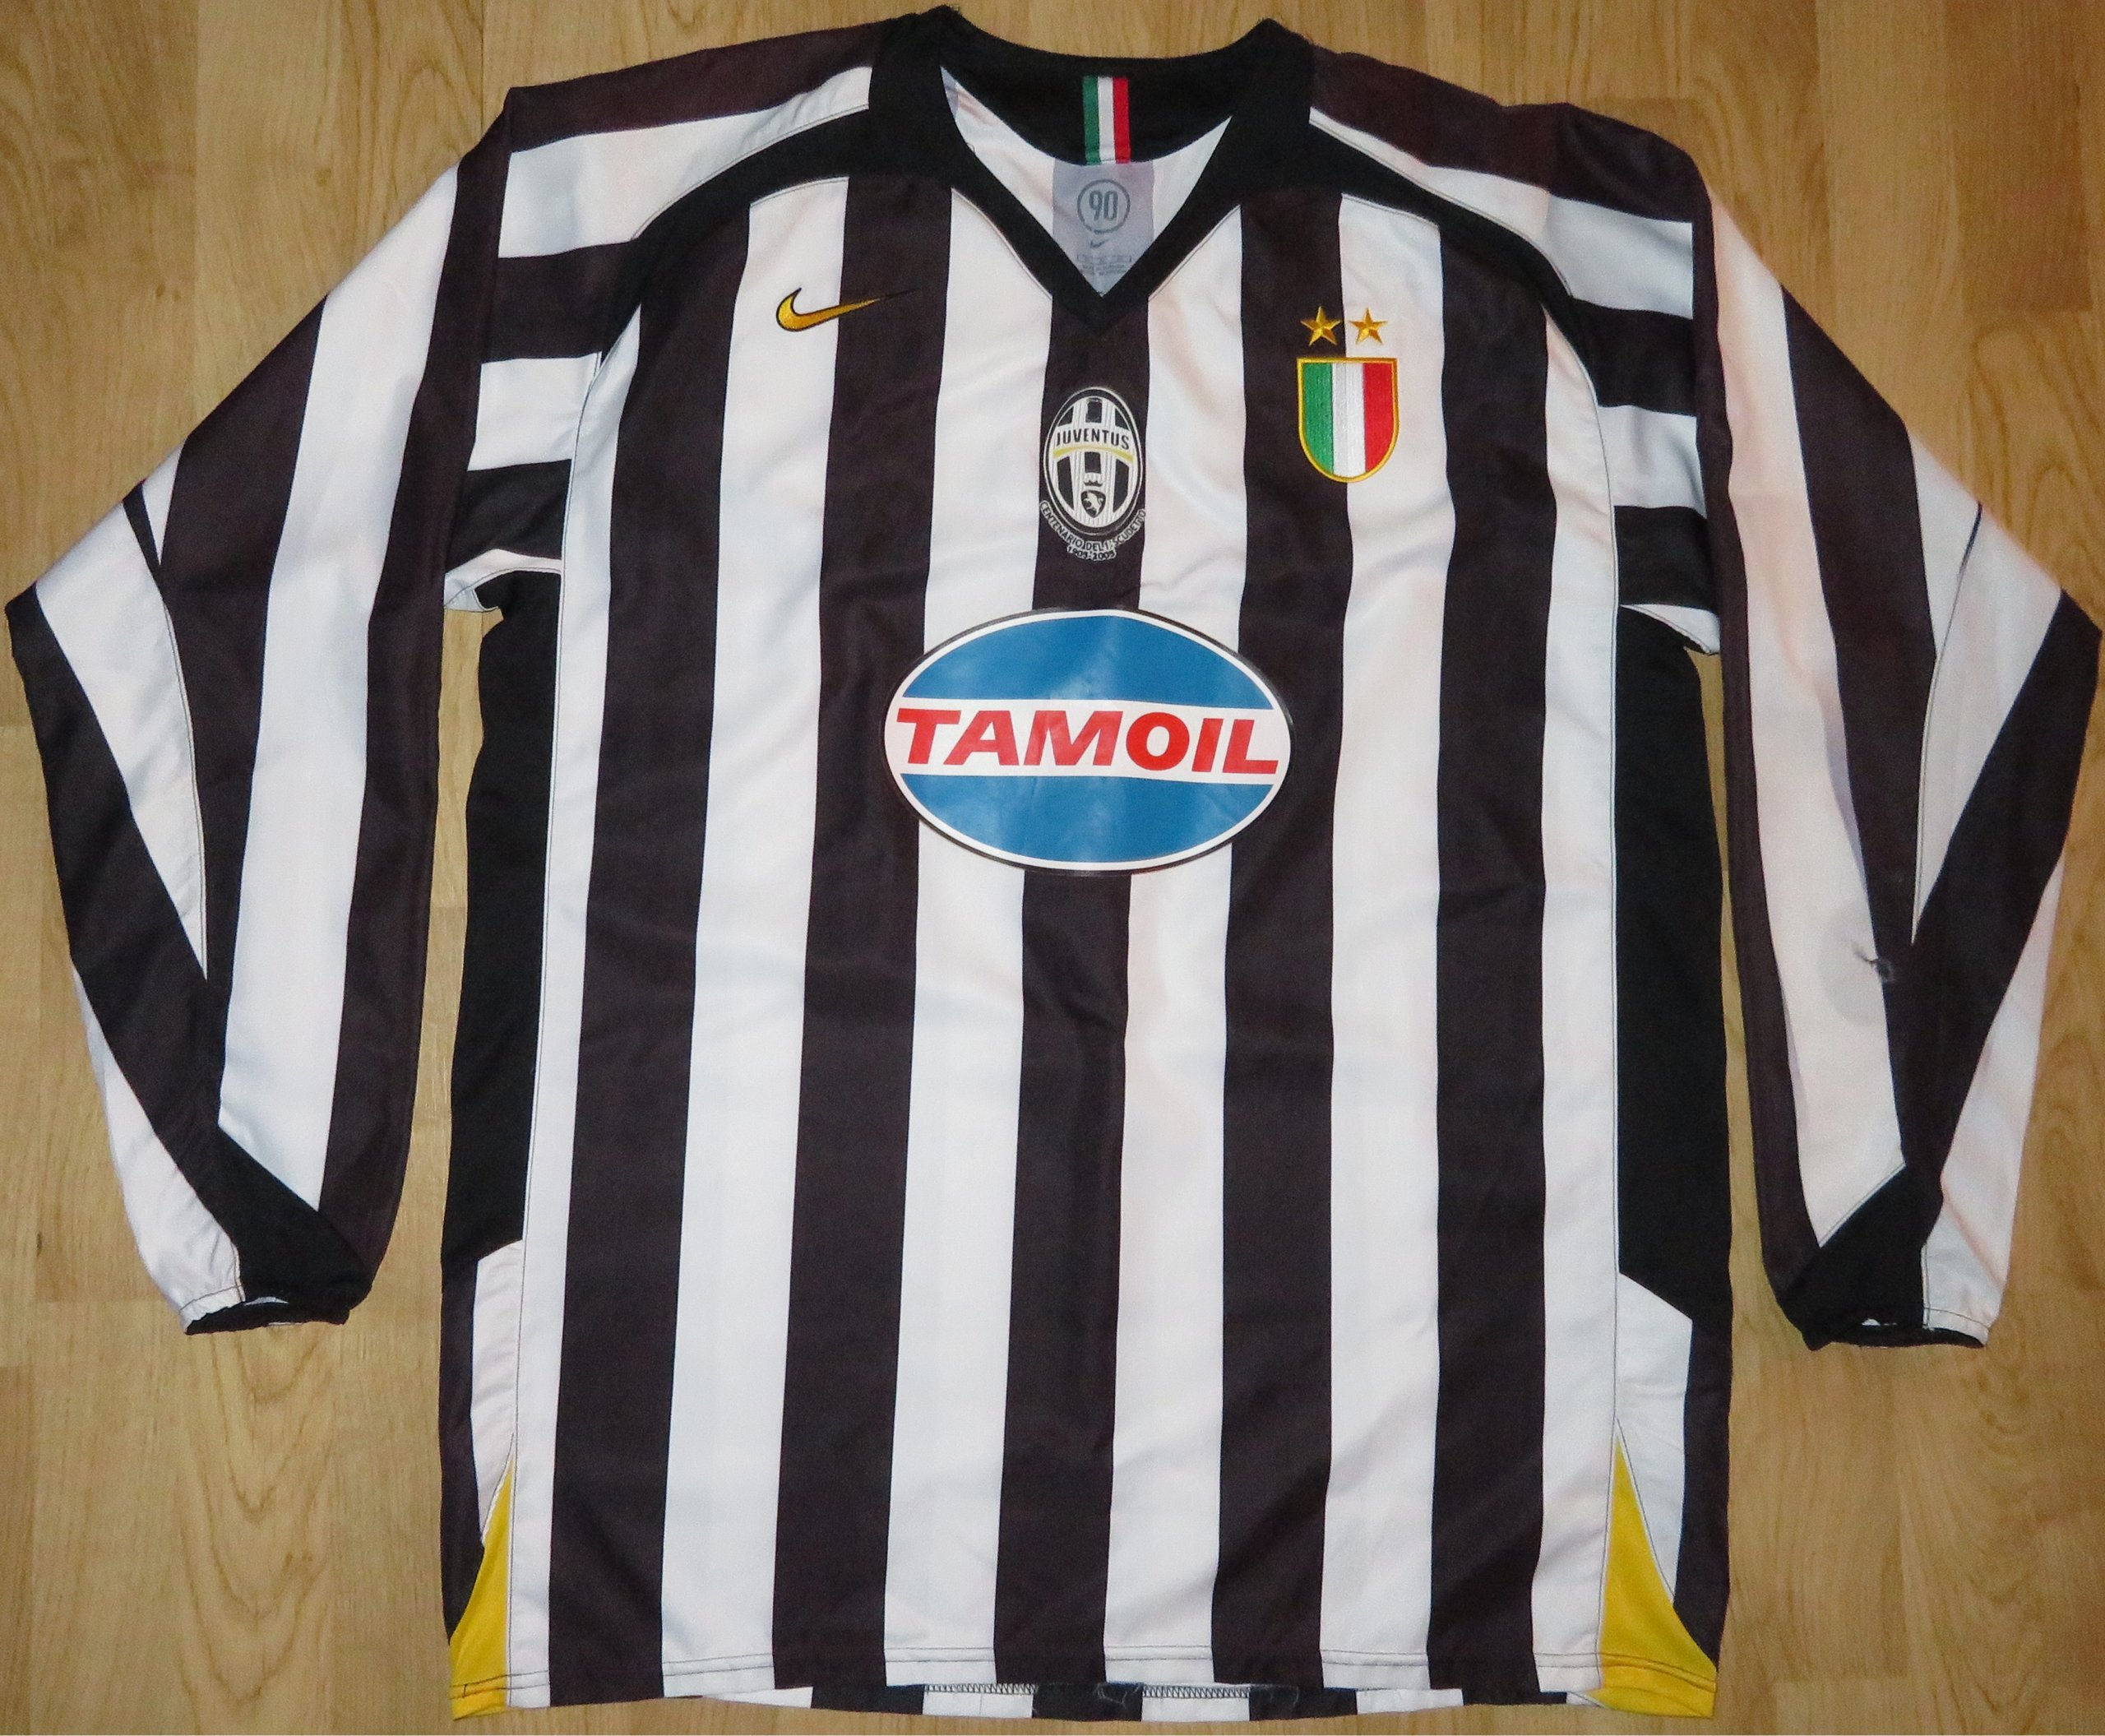 e75f4b150 Koszulka piłkarska JUVENTUS 0506 XL Nike IBRA! - 7199862966 ...